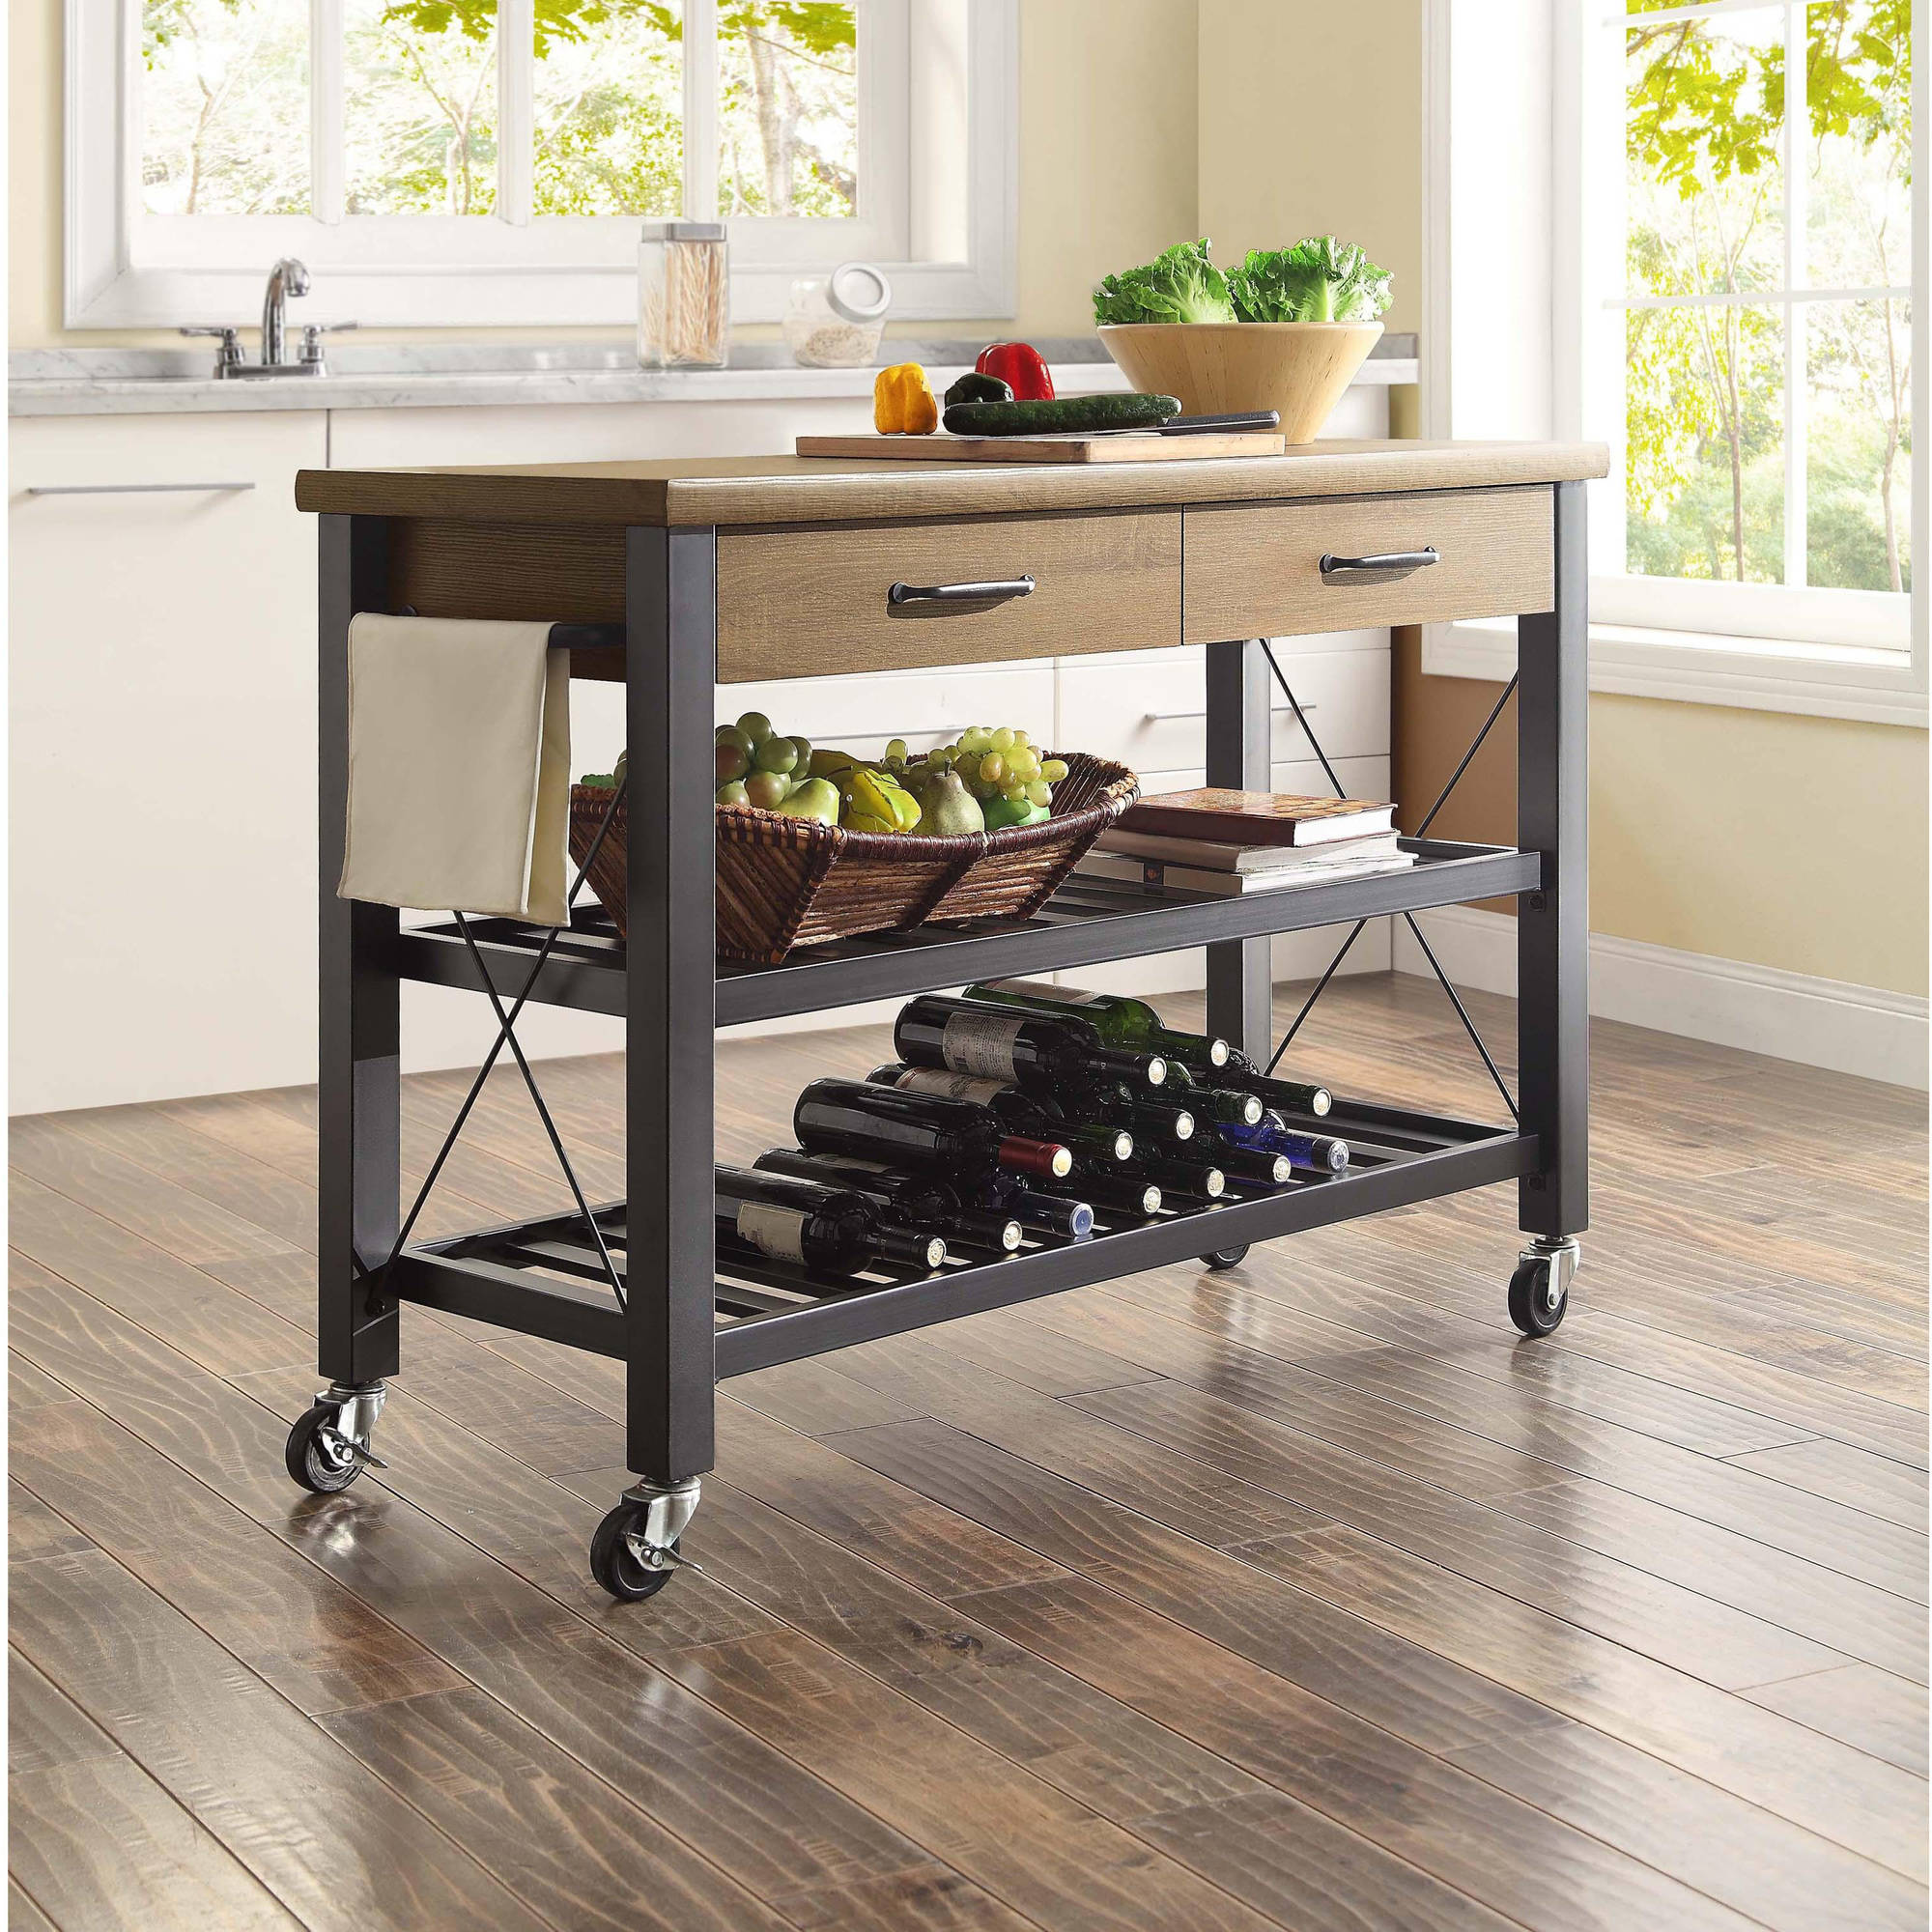 Kitchen Shelves Walmart: Whalen Santa Fe Kitchen Cart With Metal Shelves And TV